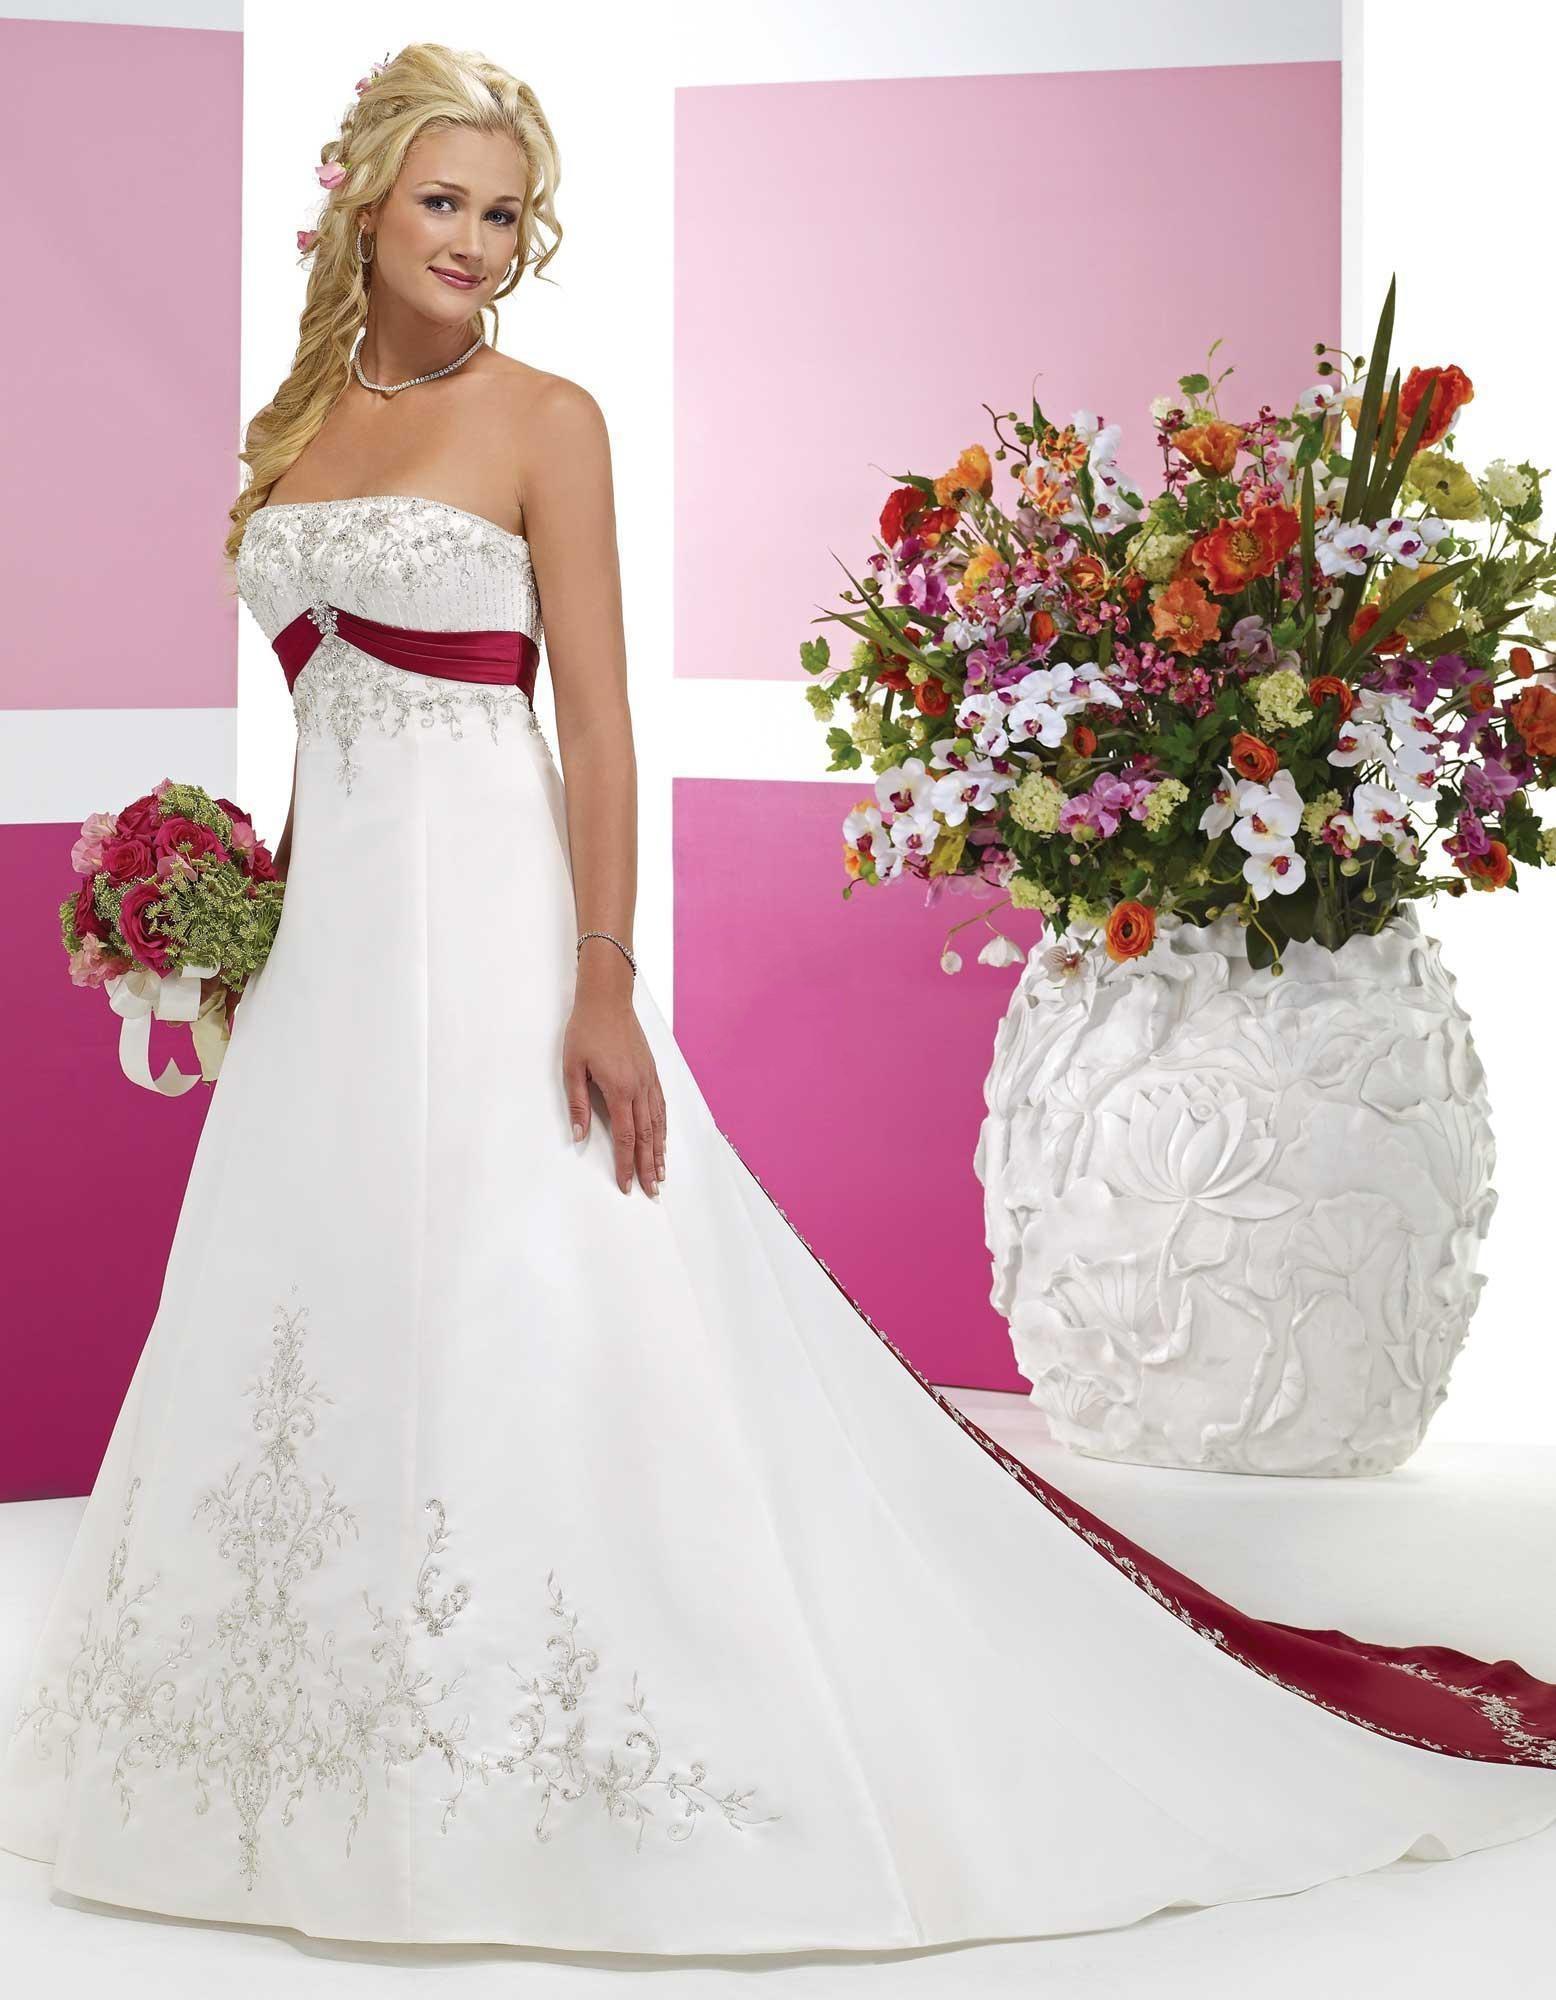 Vestidos de novia blancos 2016 – Vestidos de moda de esta temporada